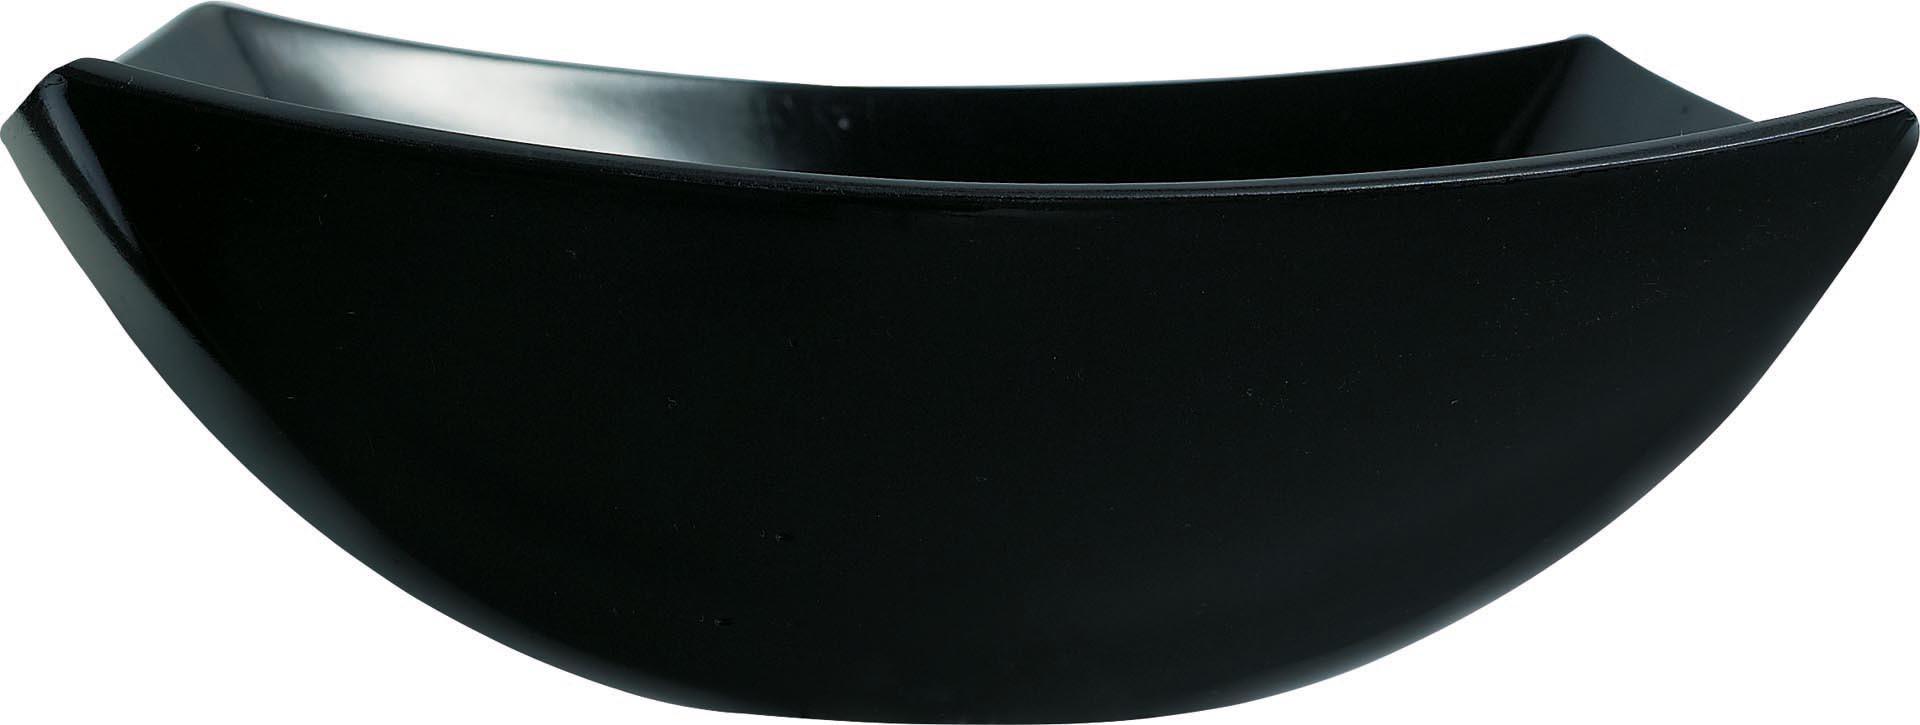 "Hartglas-Schale ""Quadrato"" schwarz 14 x 14 cm"